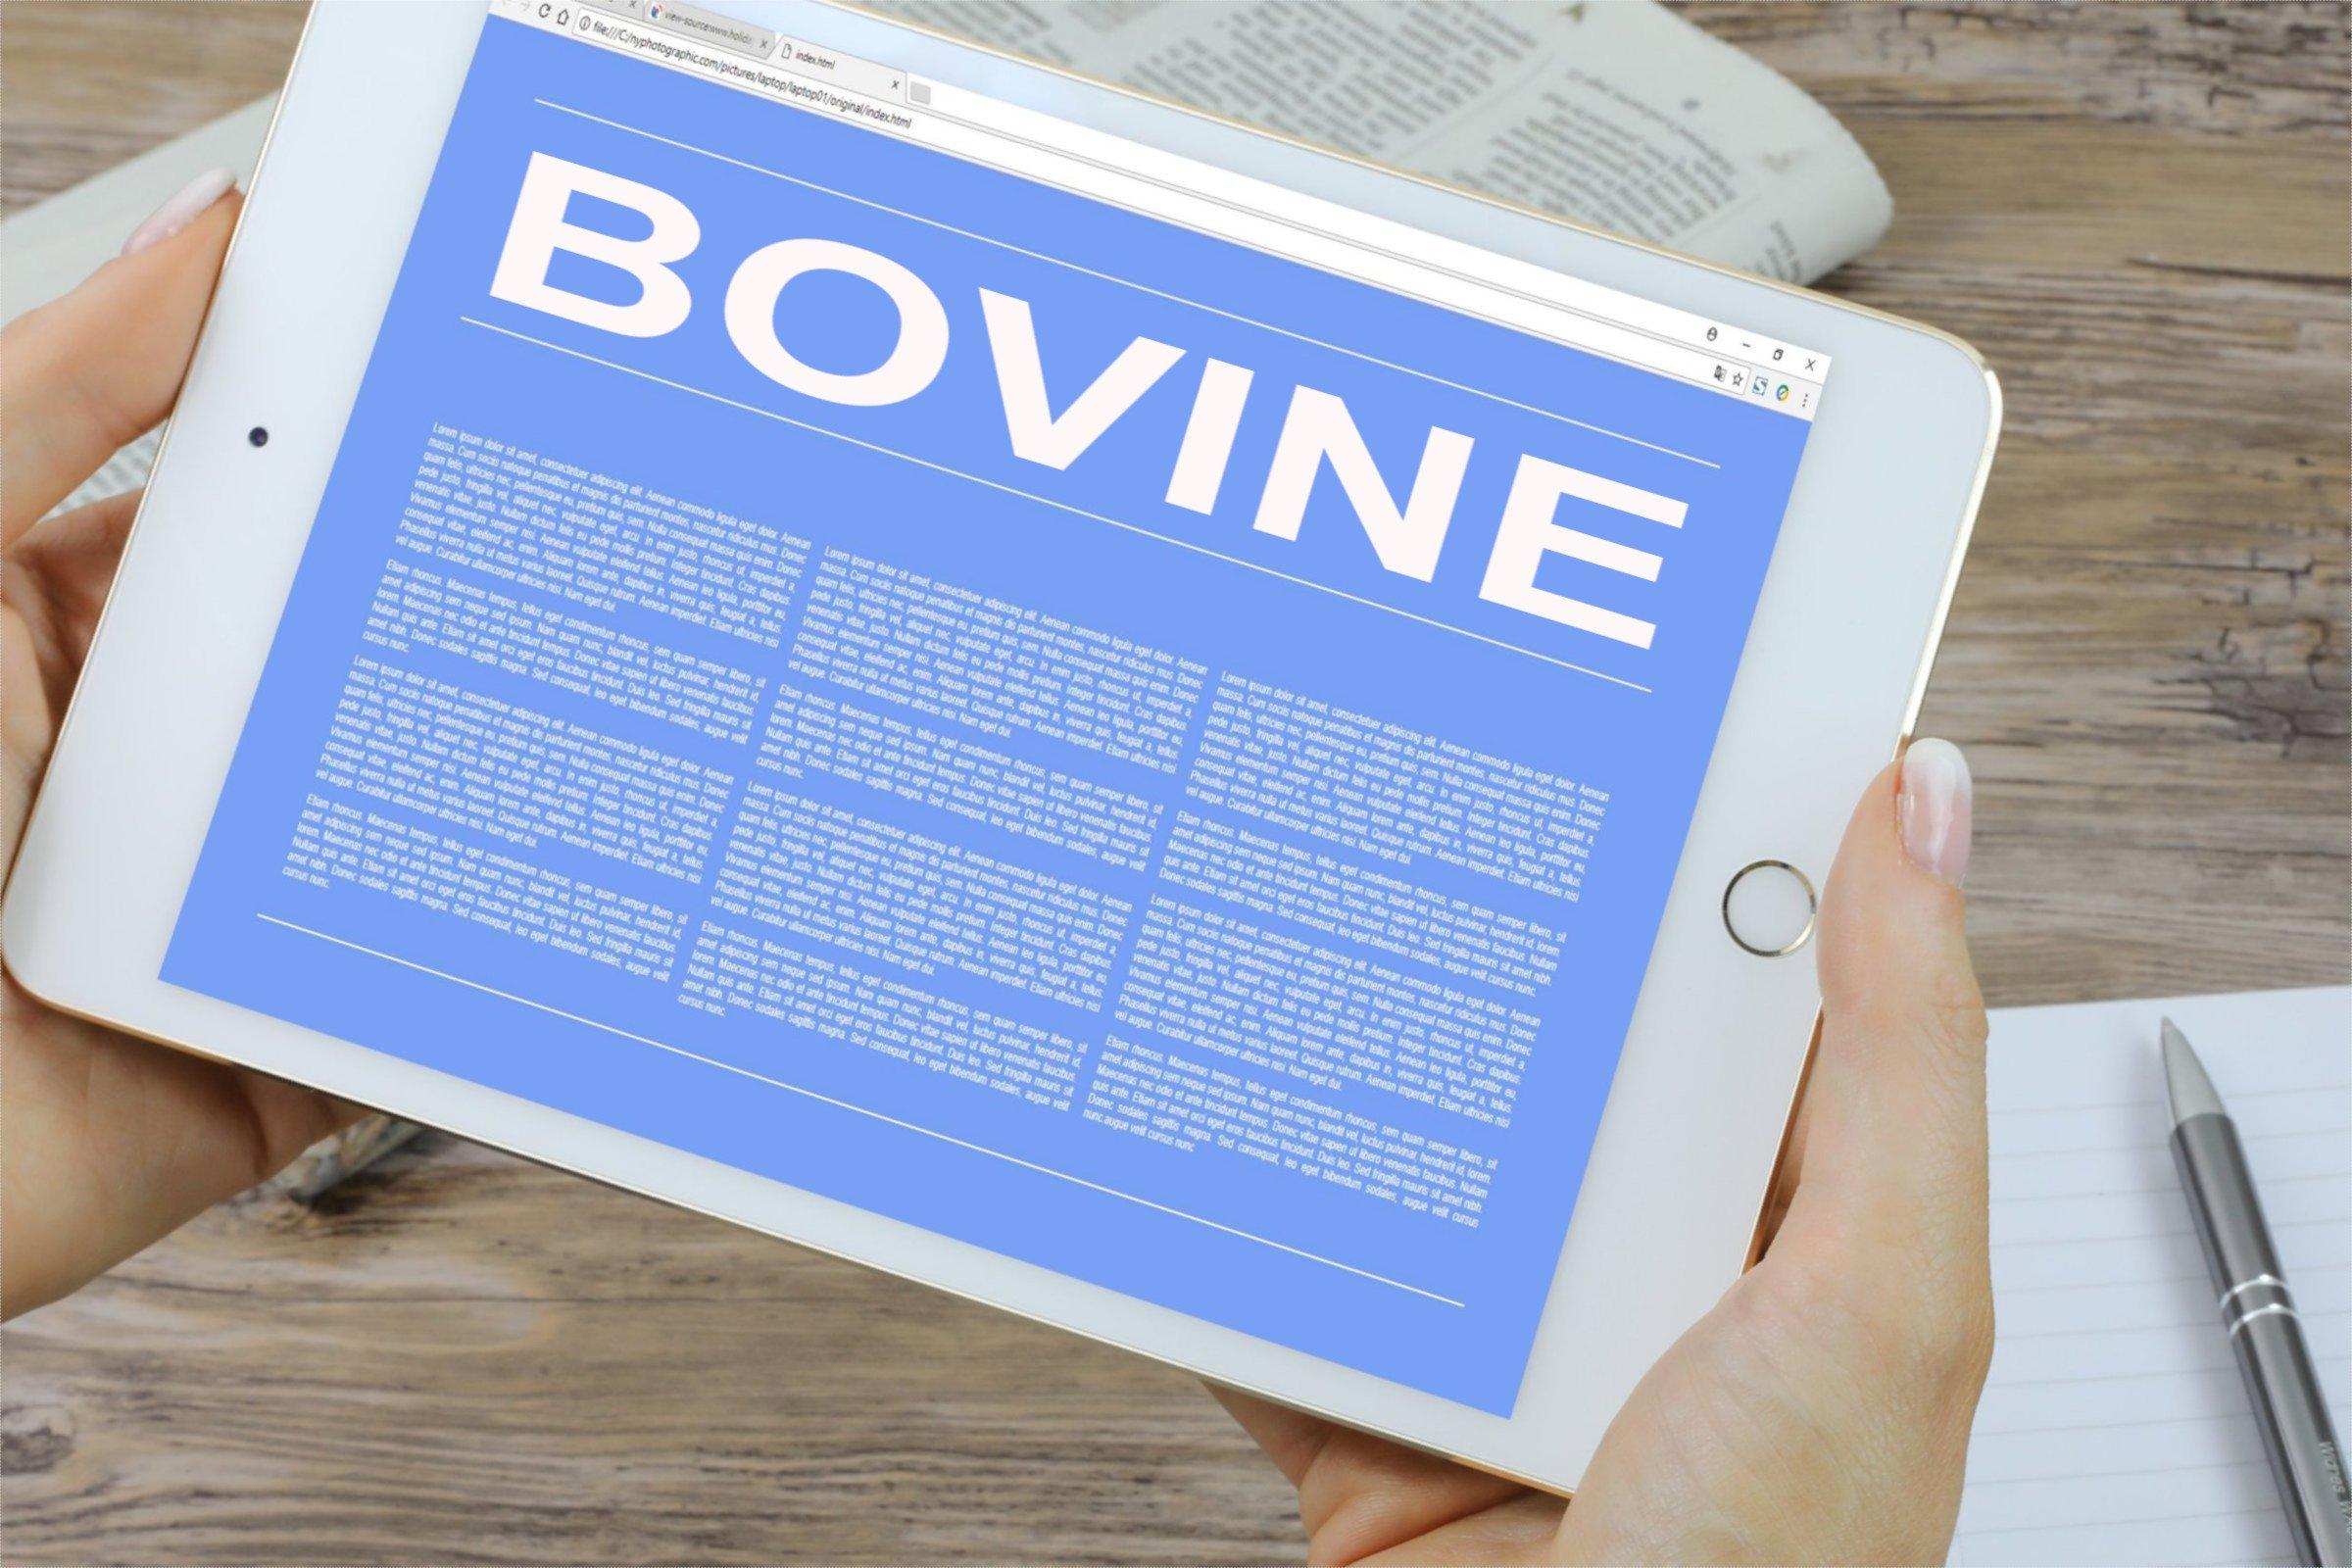 Bovine